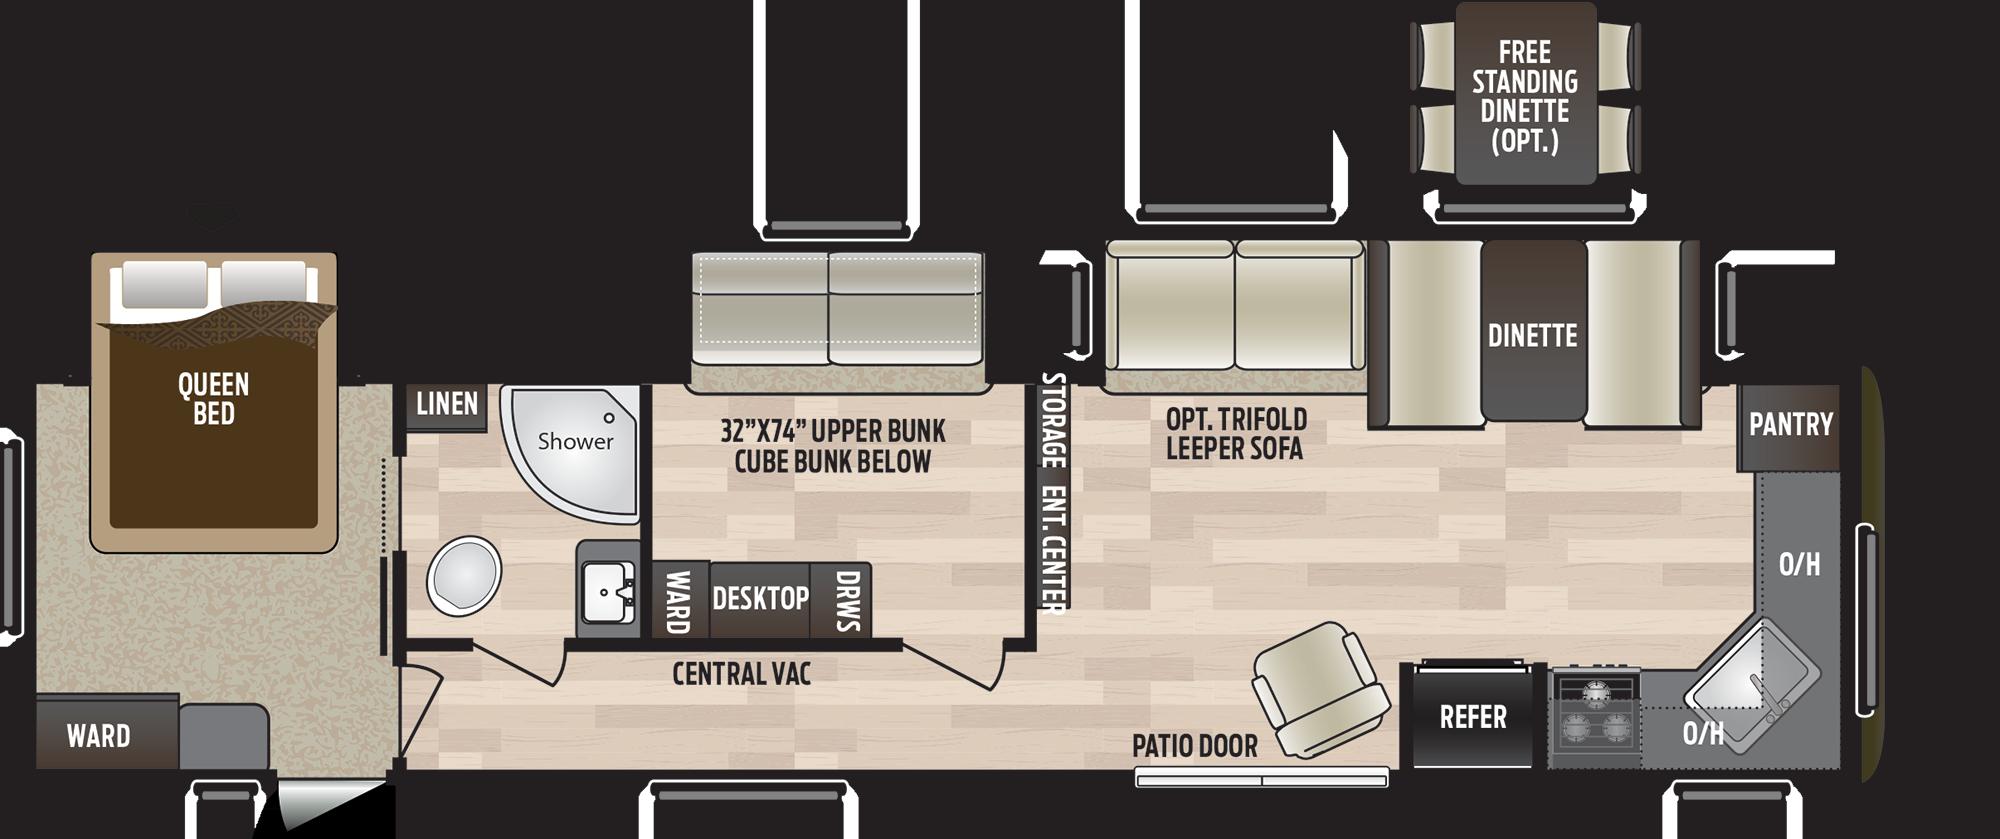 2020 KEYSTONE HIDEOUT 38FKTS (bunks) Floorplan